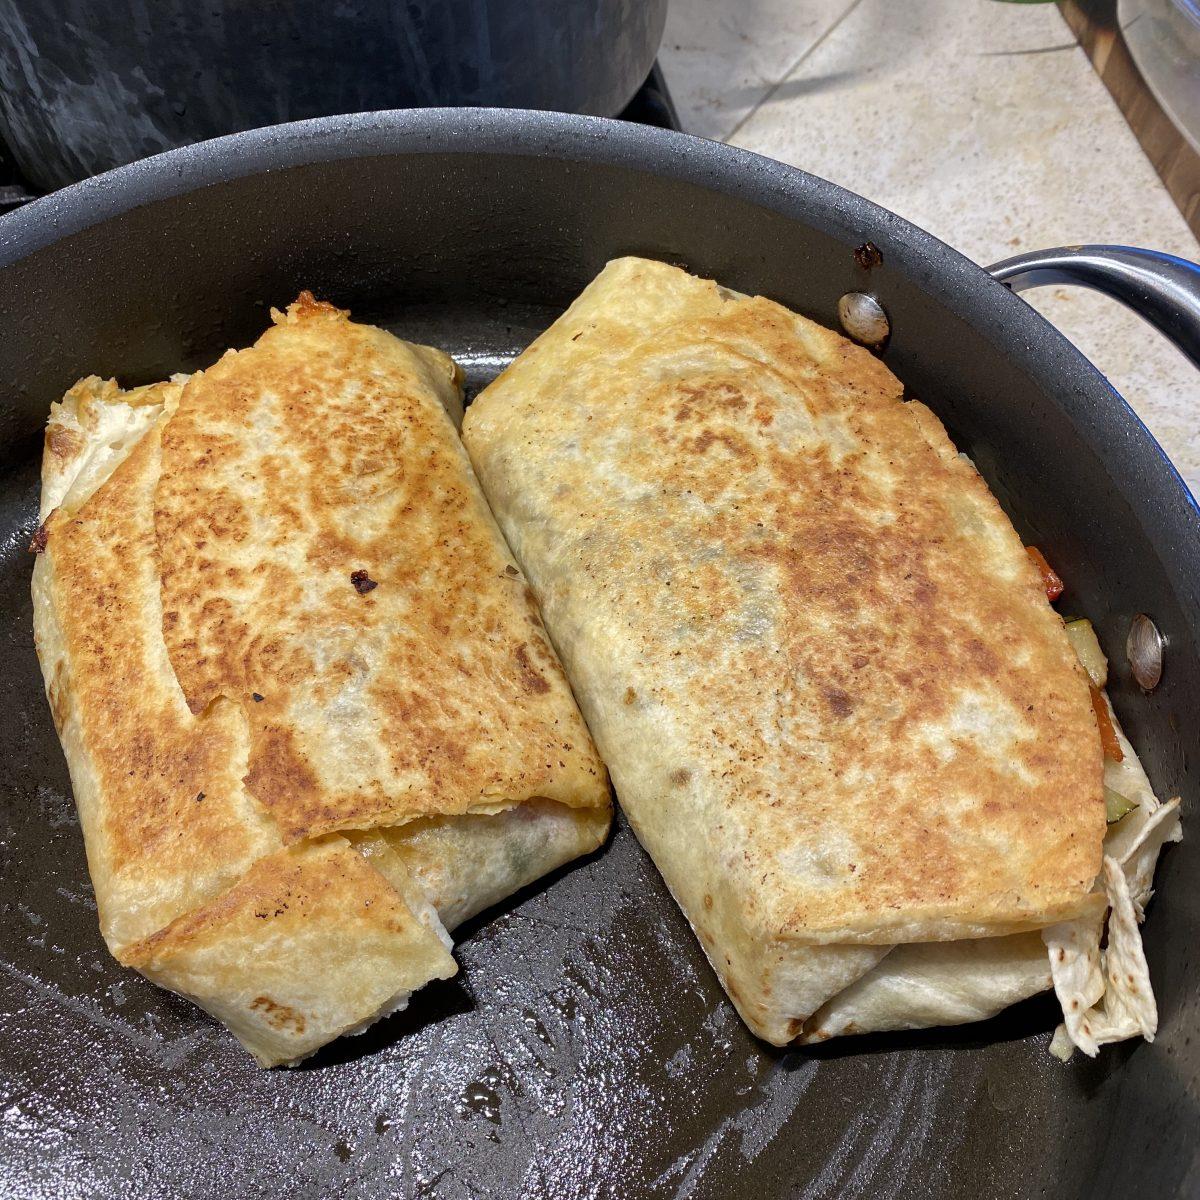 McGeeto's Veggie Burritos